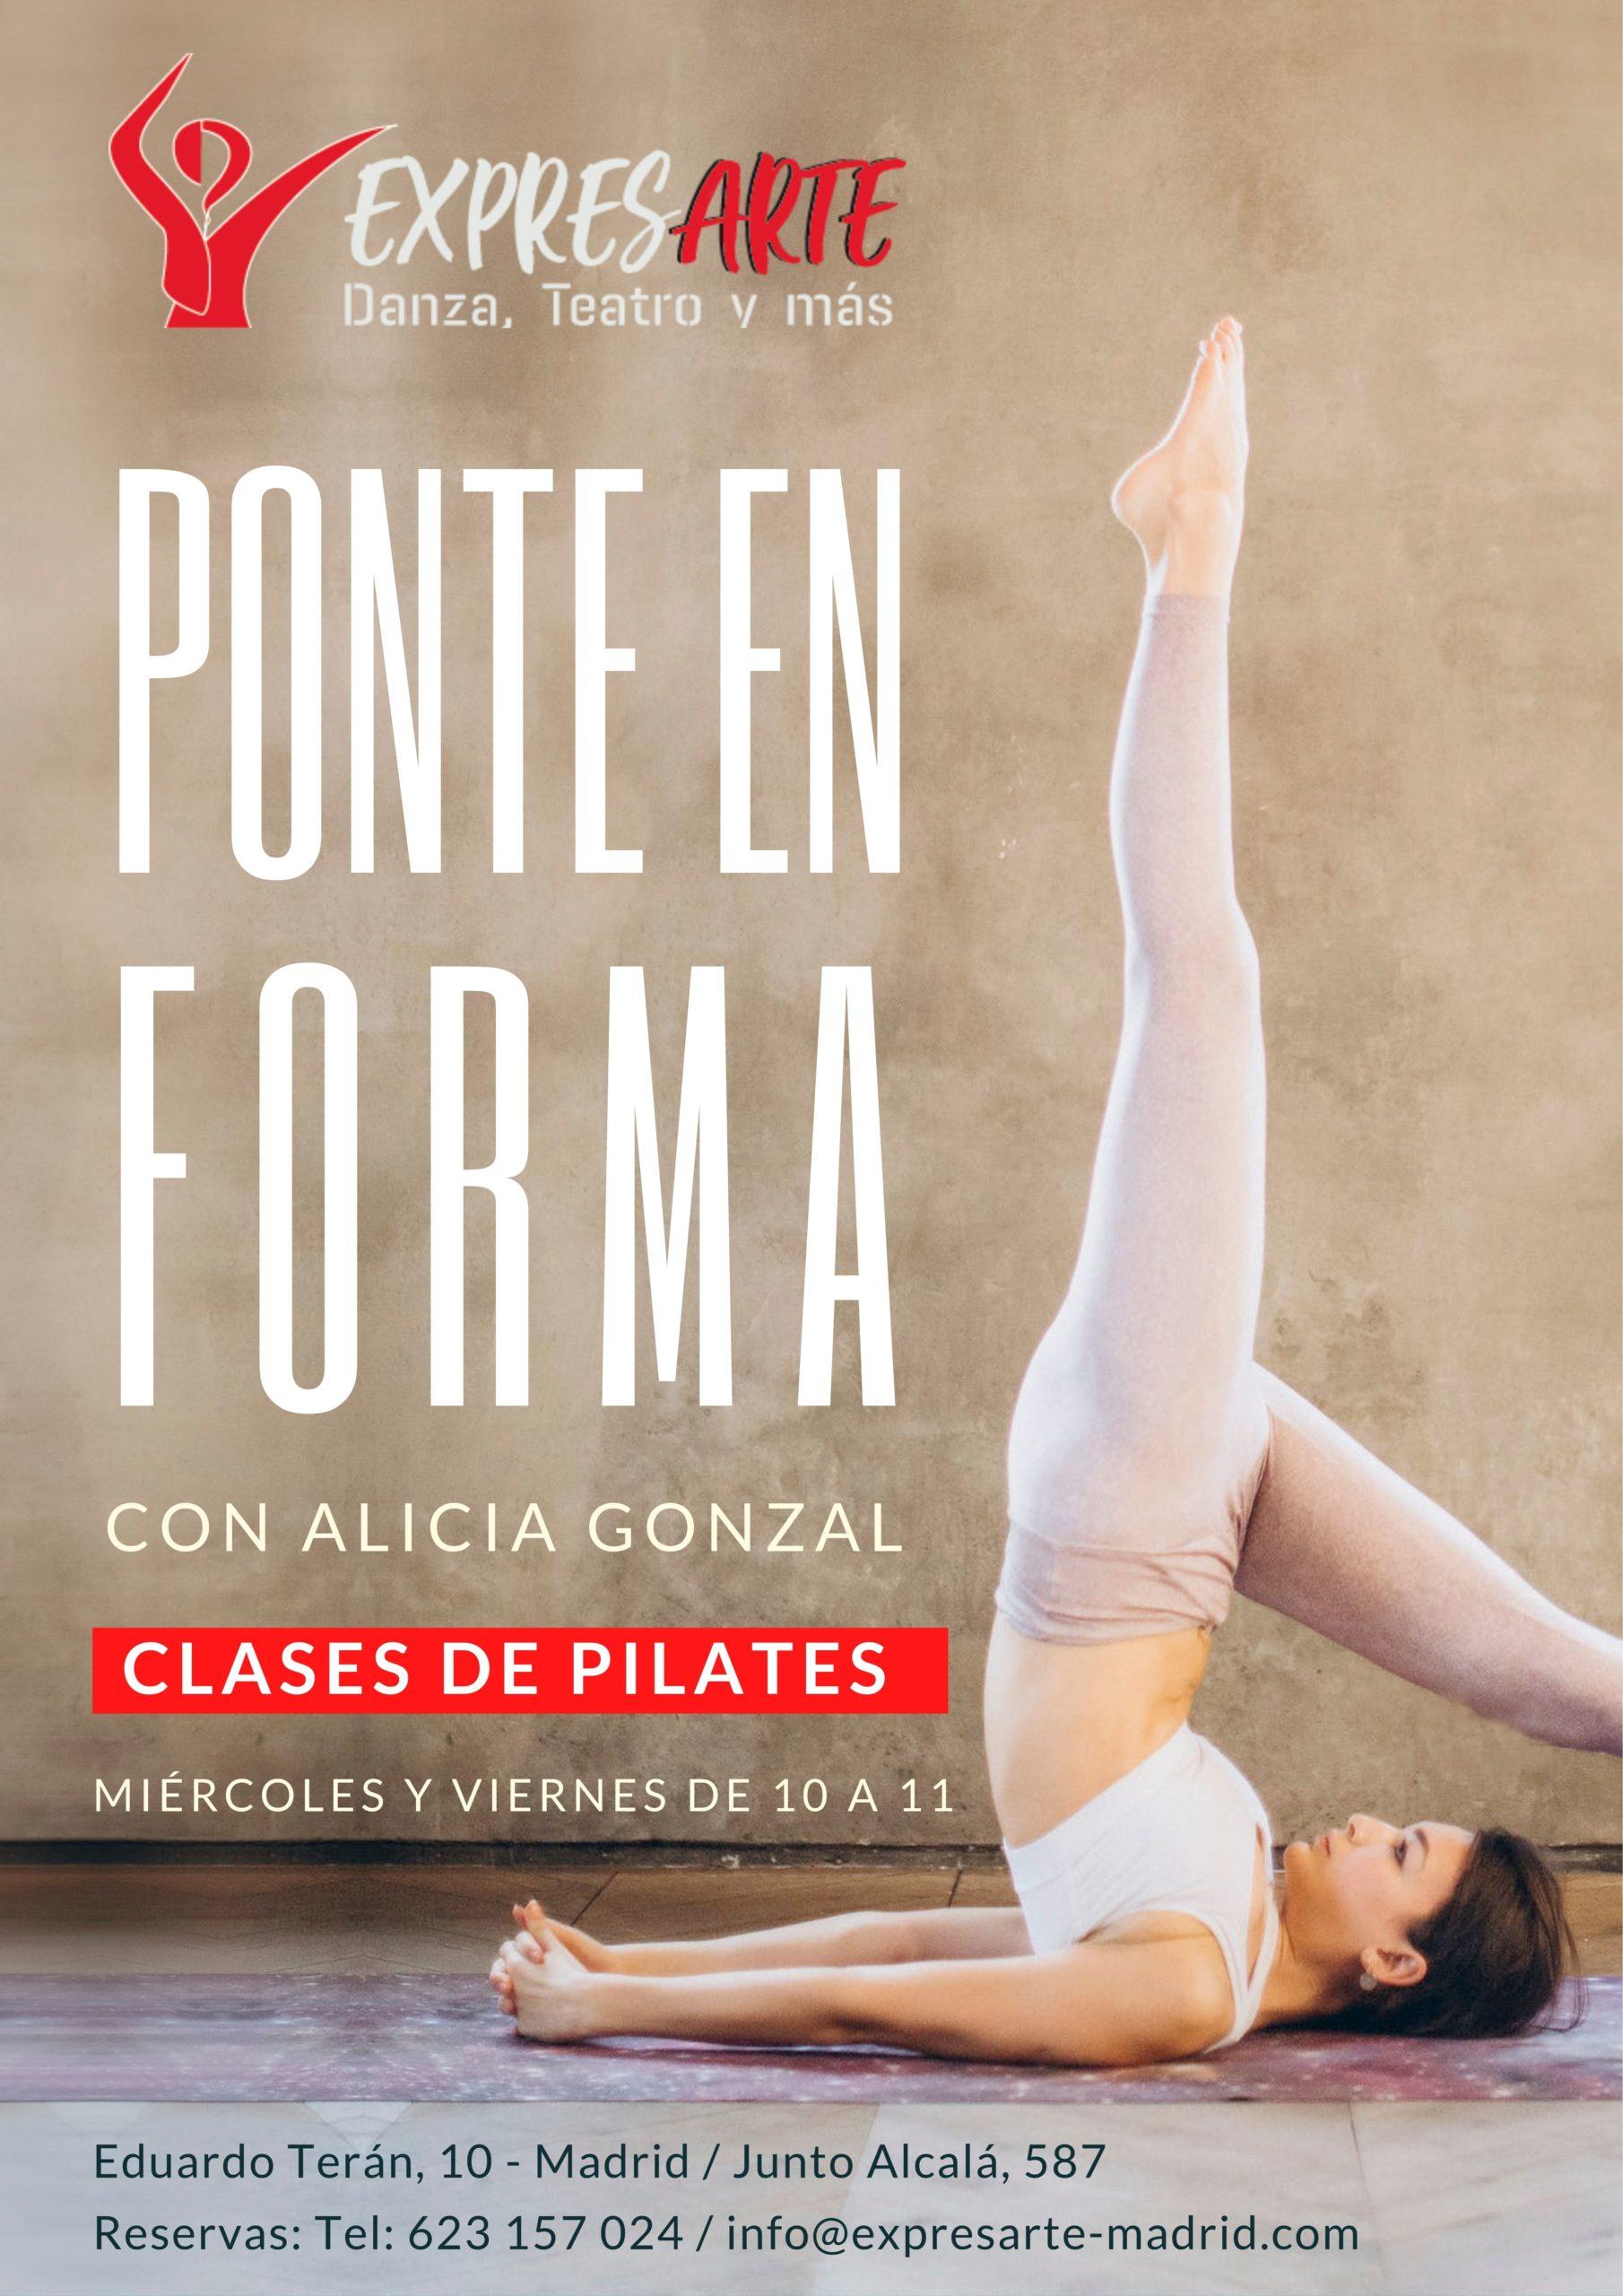 Clases de Pilates en Canillejas, Madrid.